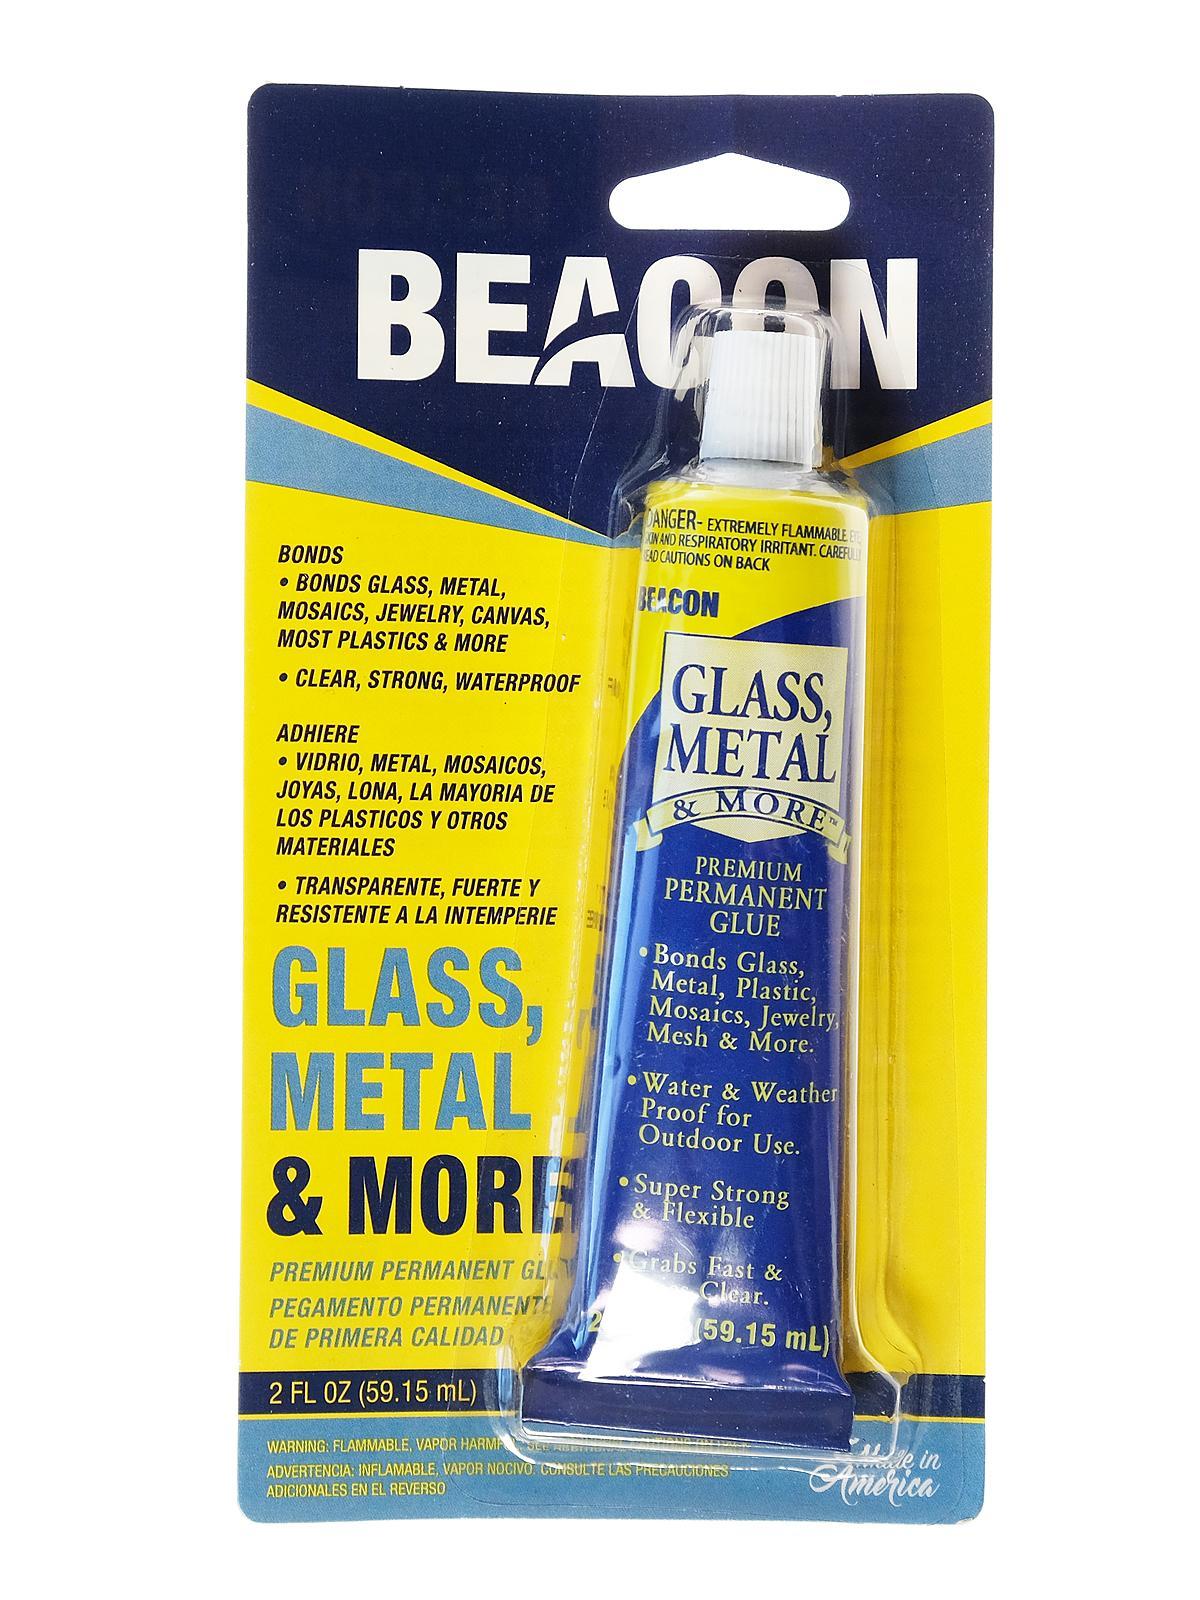 Beacon glass metal premium permanent glue